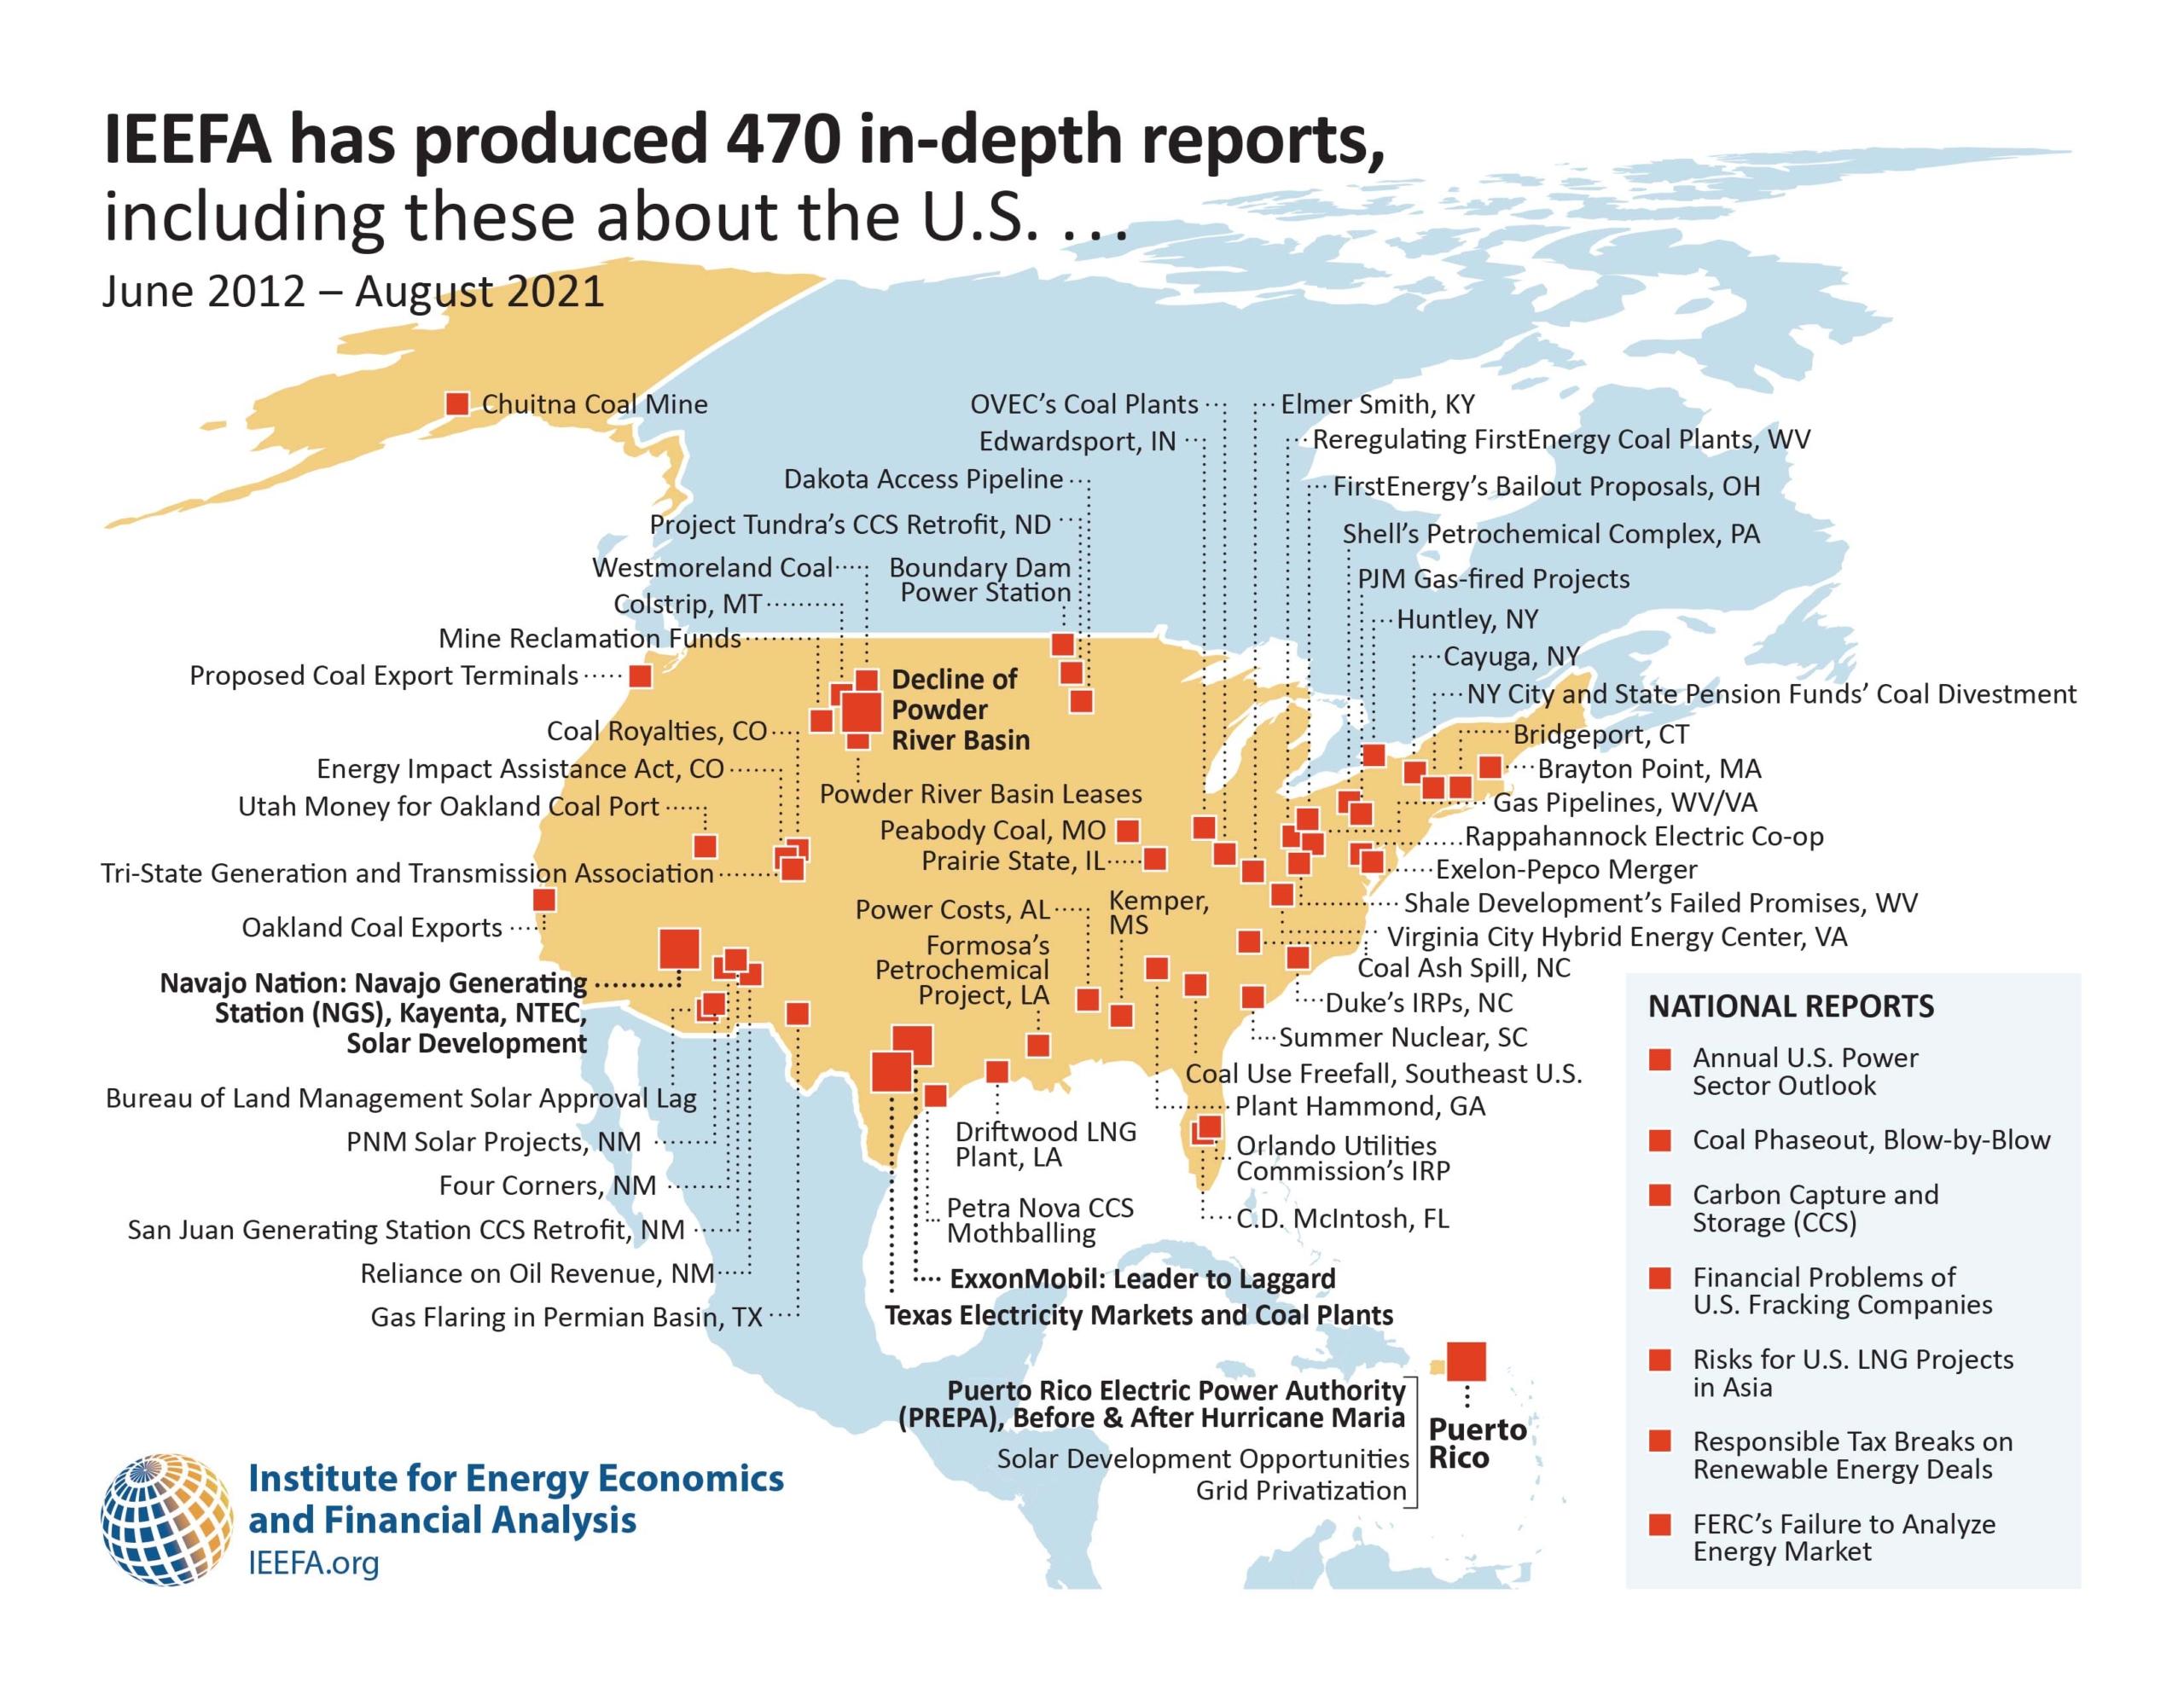 IEEFA Reports in the U.S.